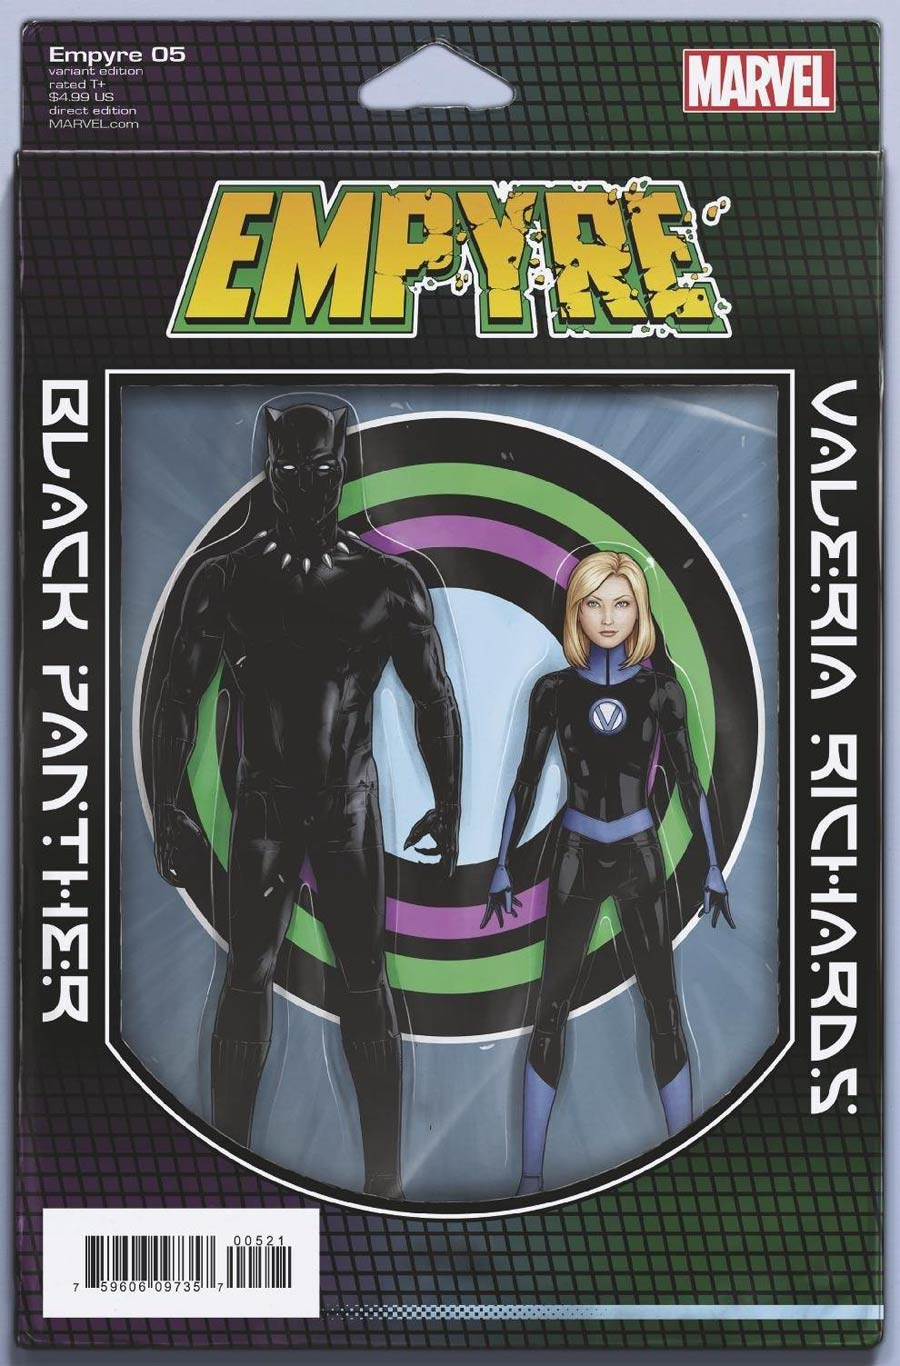 Empyre #5 Cover B Variant John Tyler Christopher 2-Pack Action Figure Cover